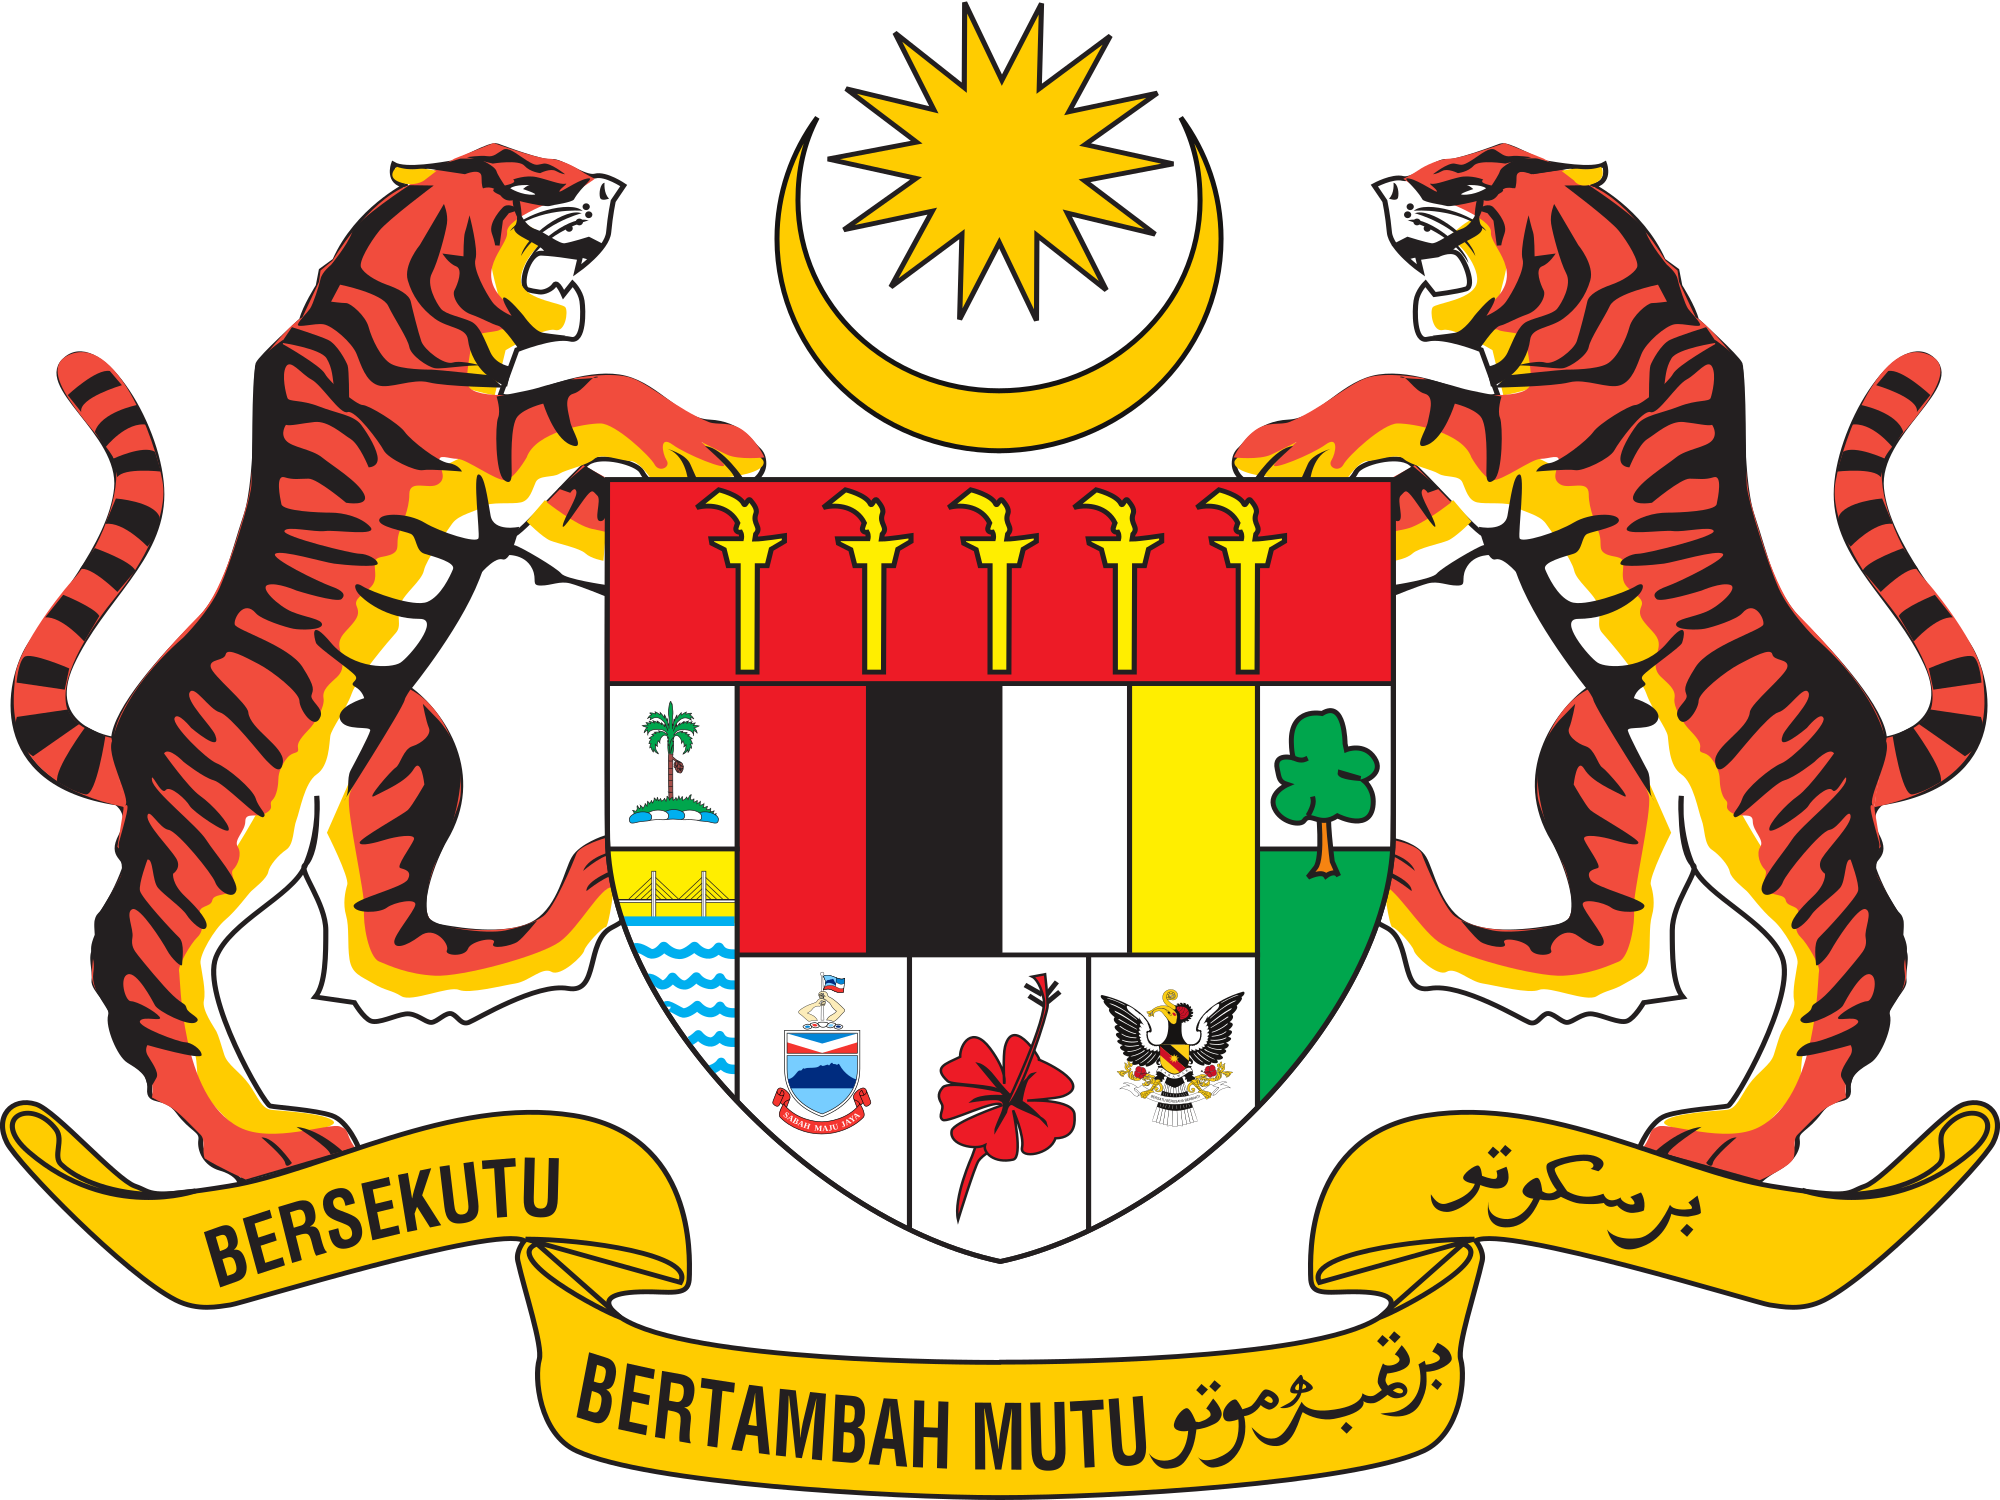 Jata Negara Malaysia's Coat of Arms. Coat of arms